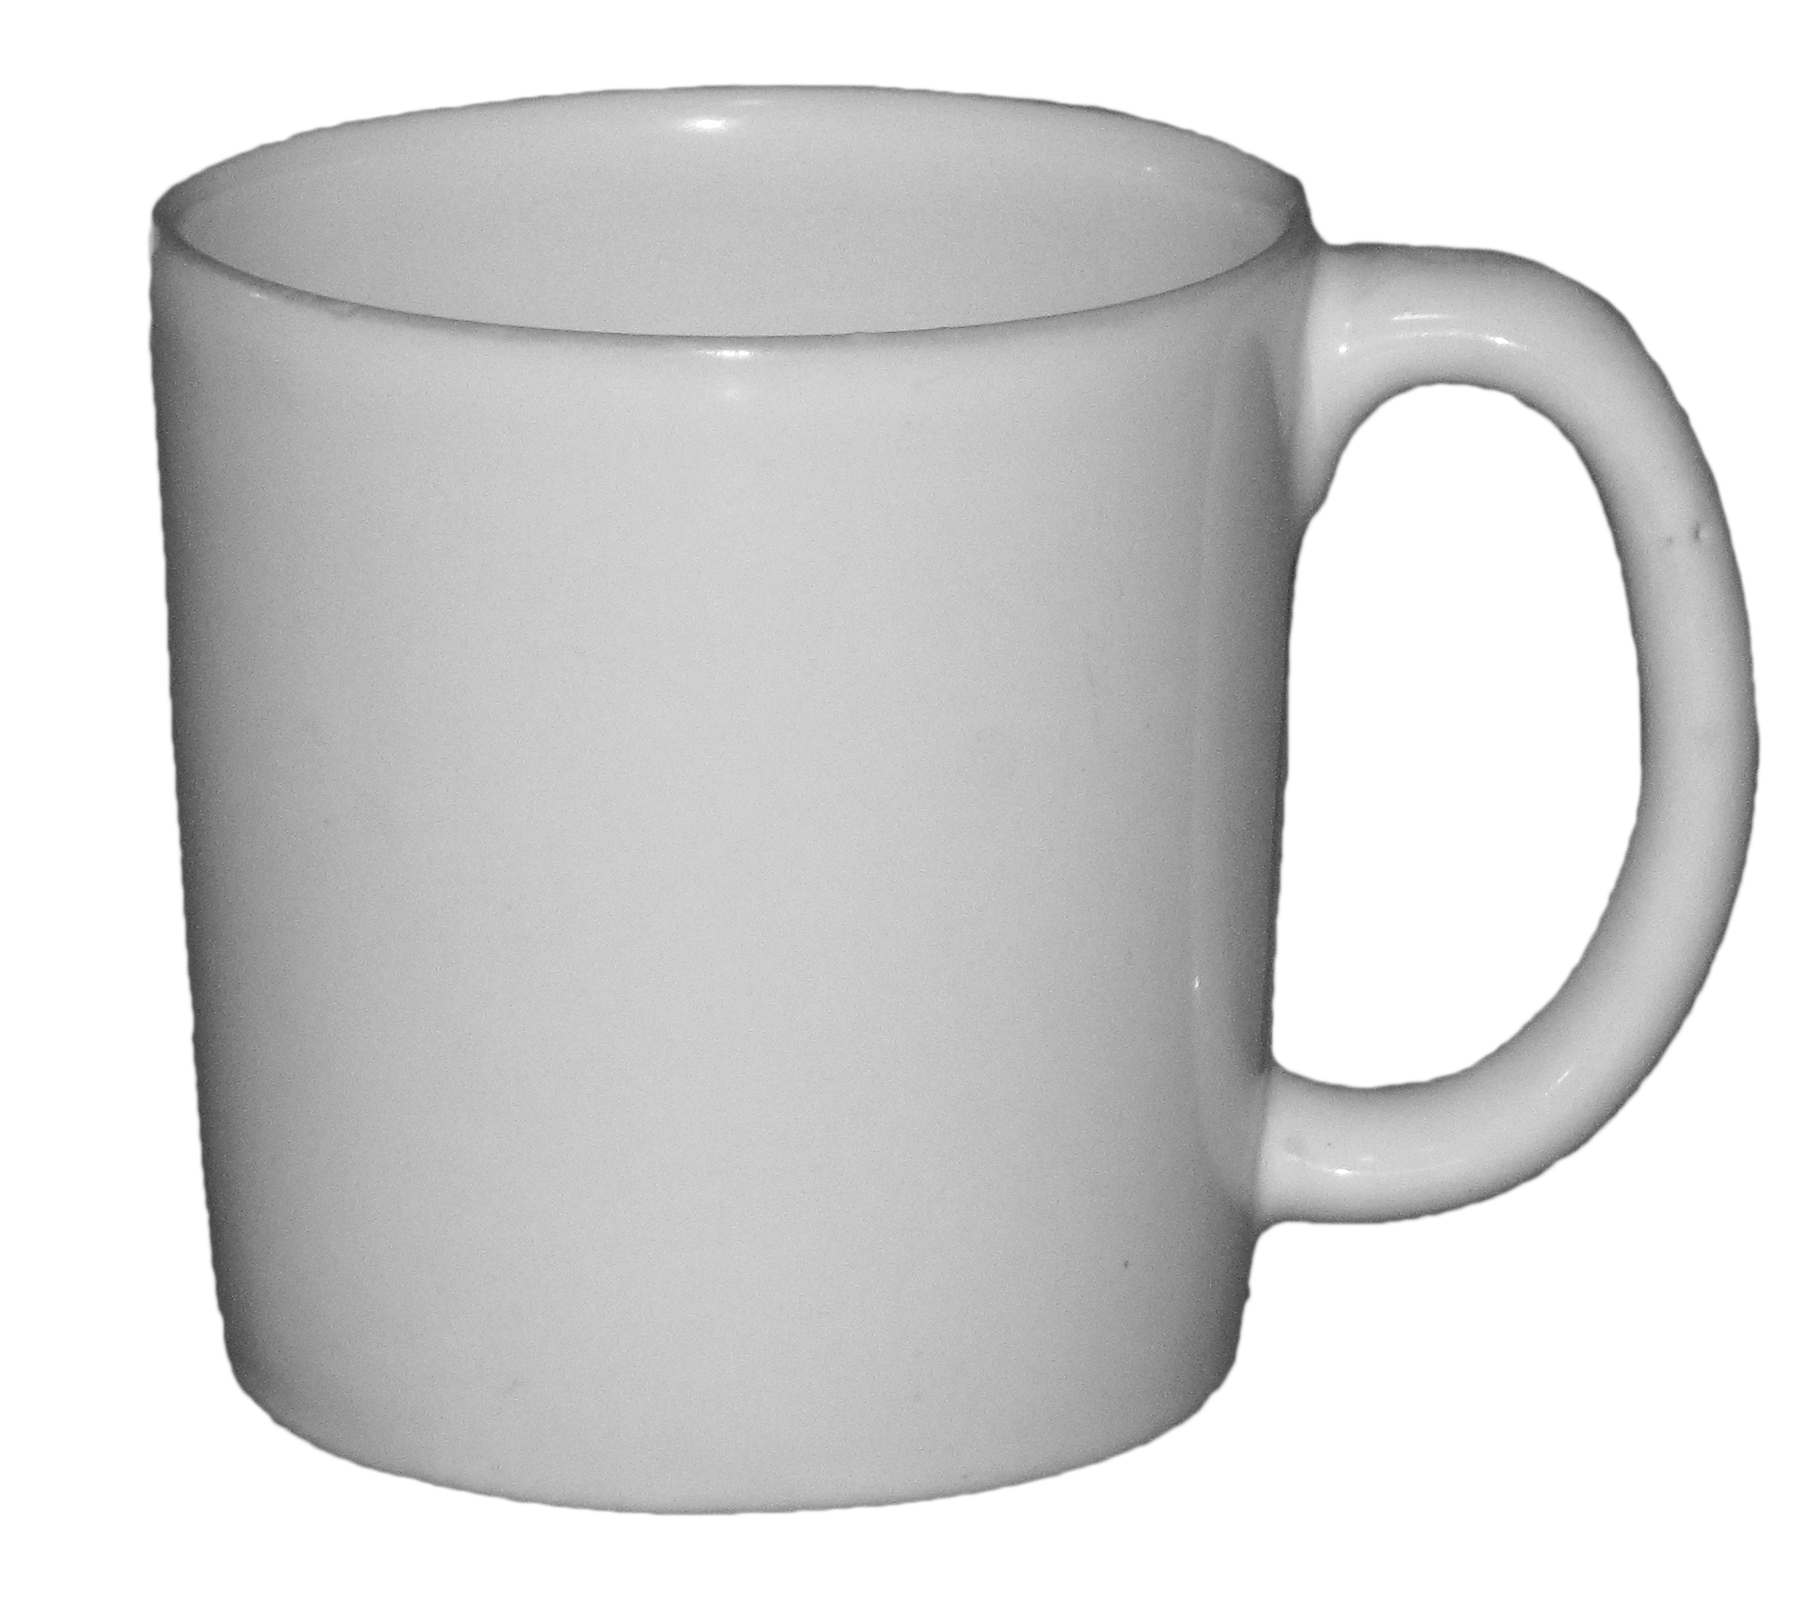 Mug PNG Transparent Images.